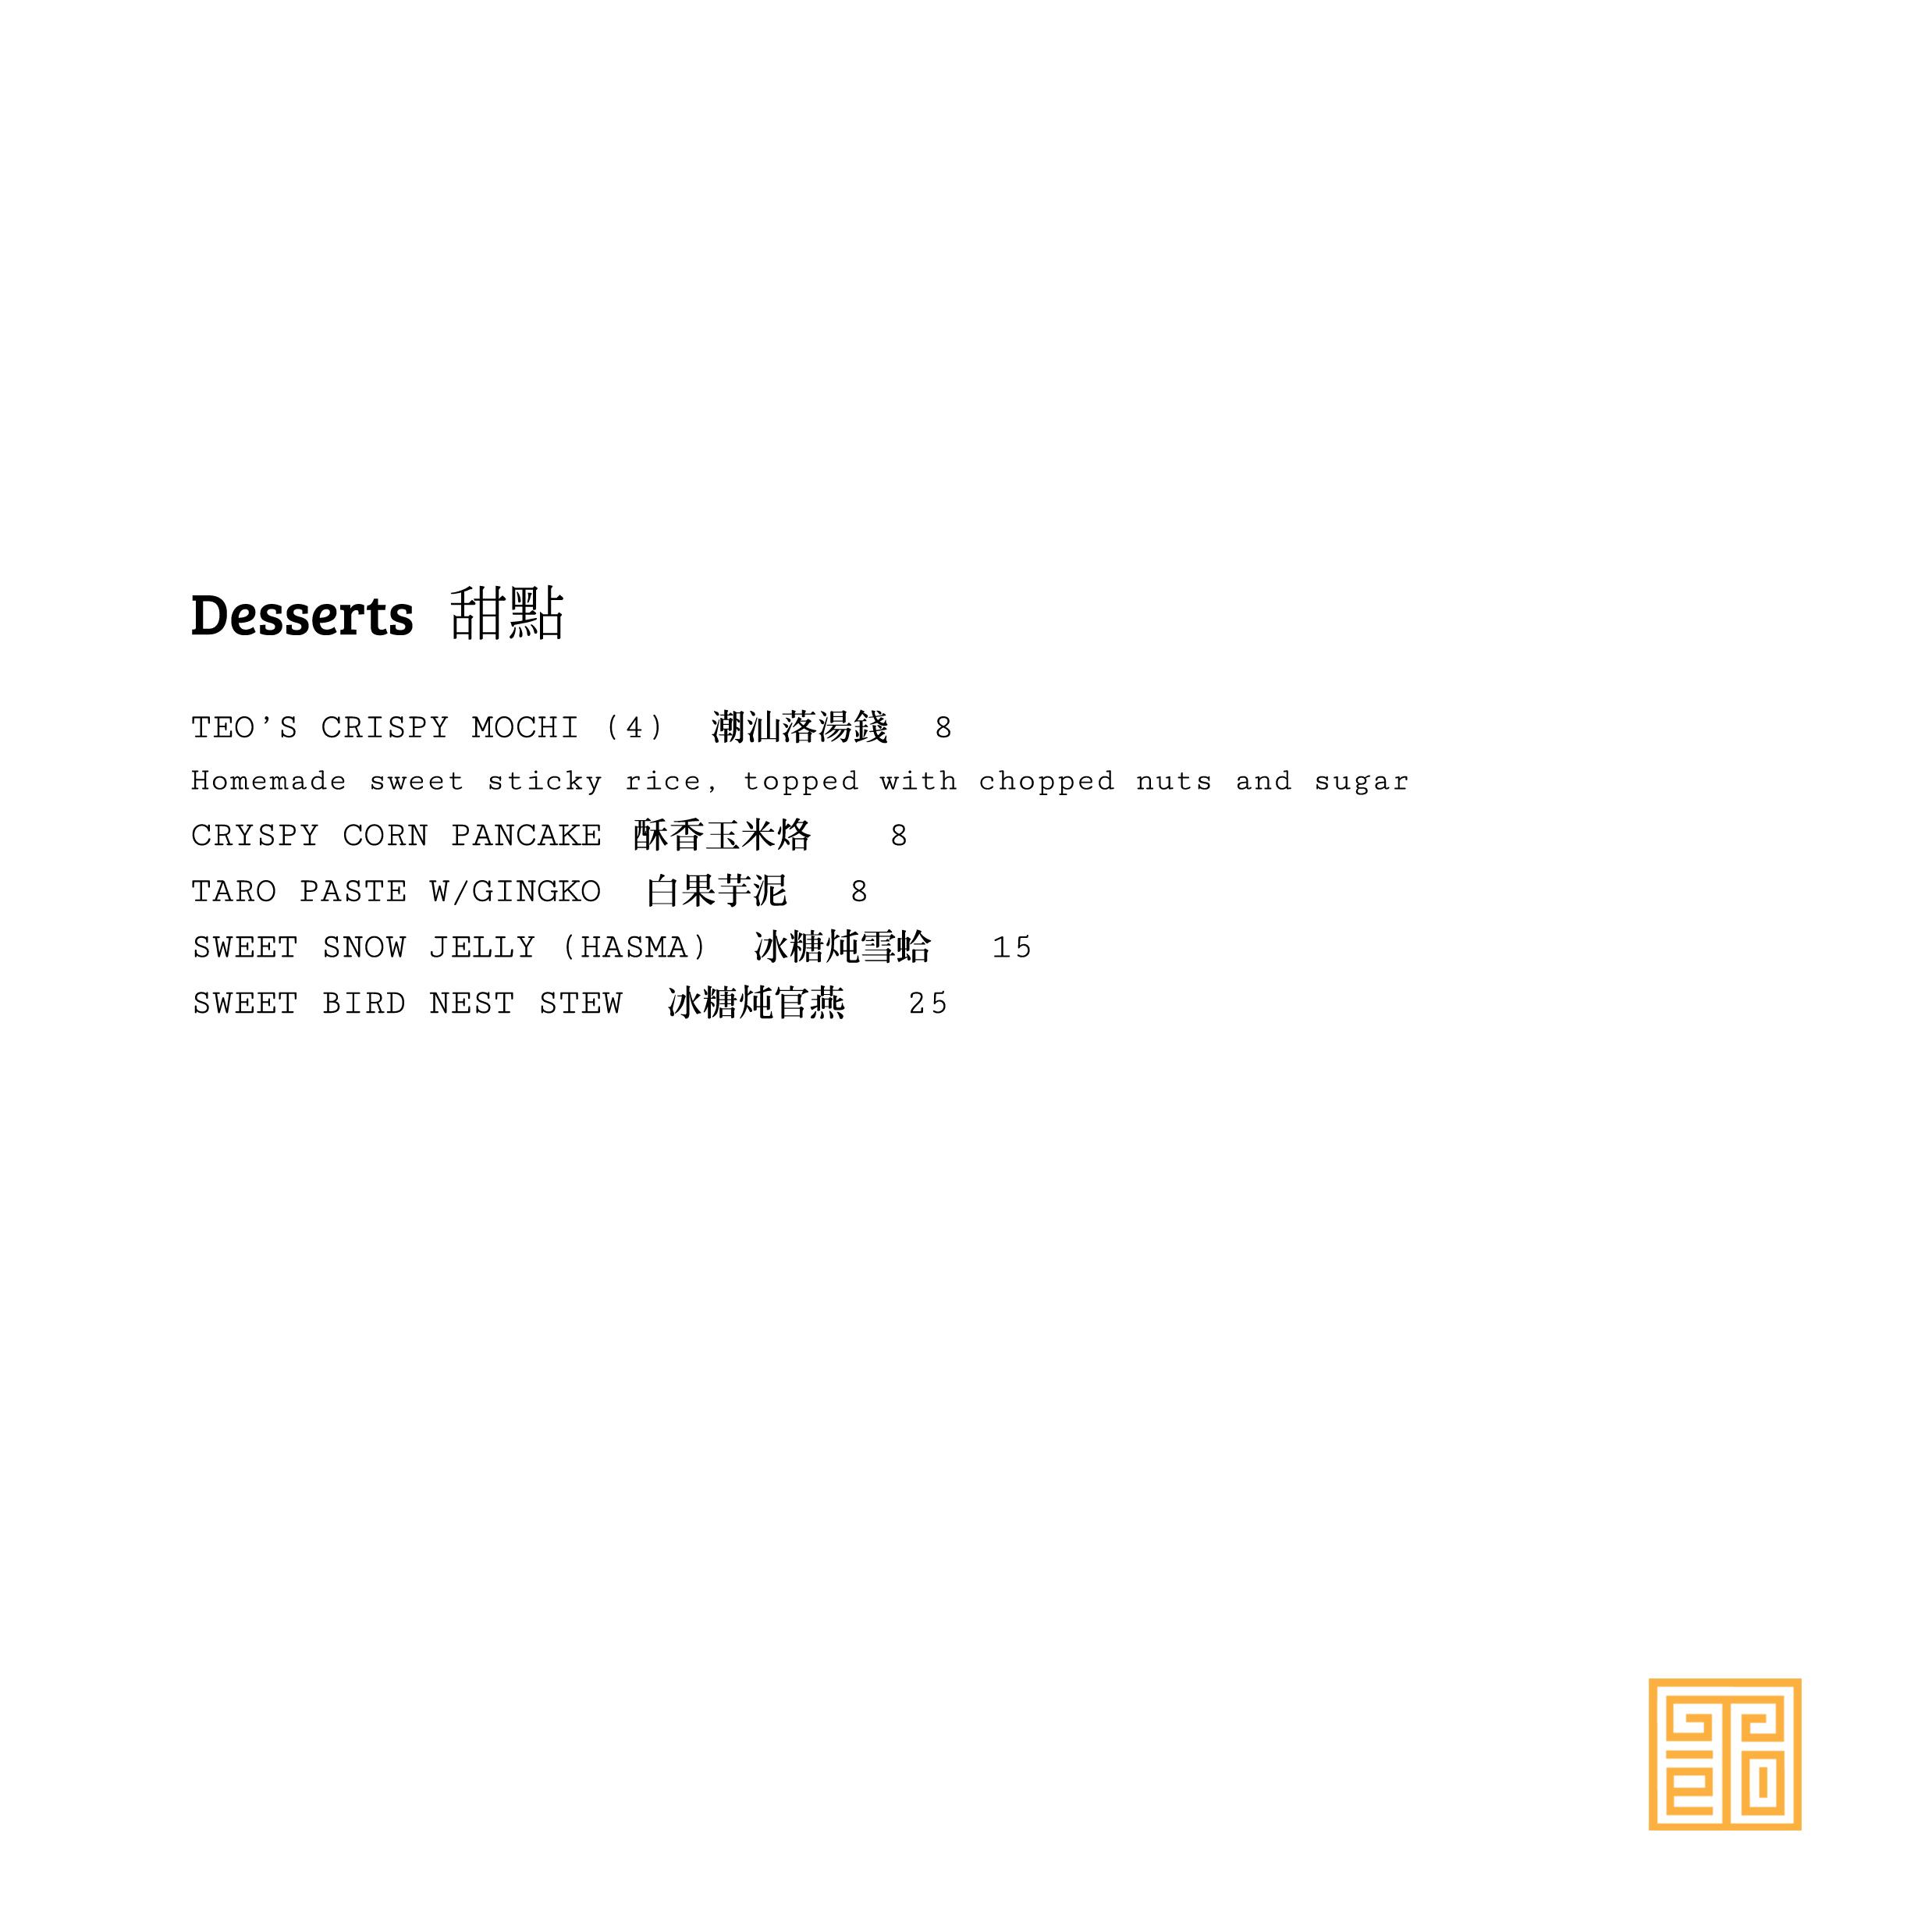 8 dessert